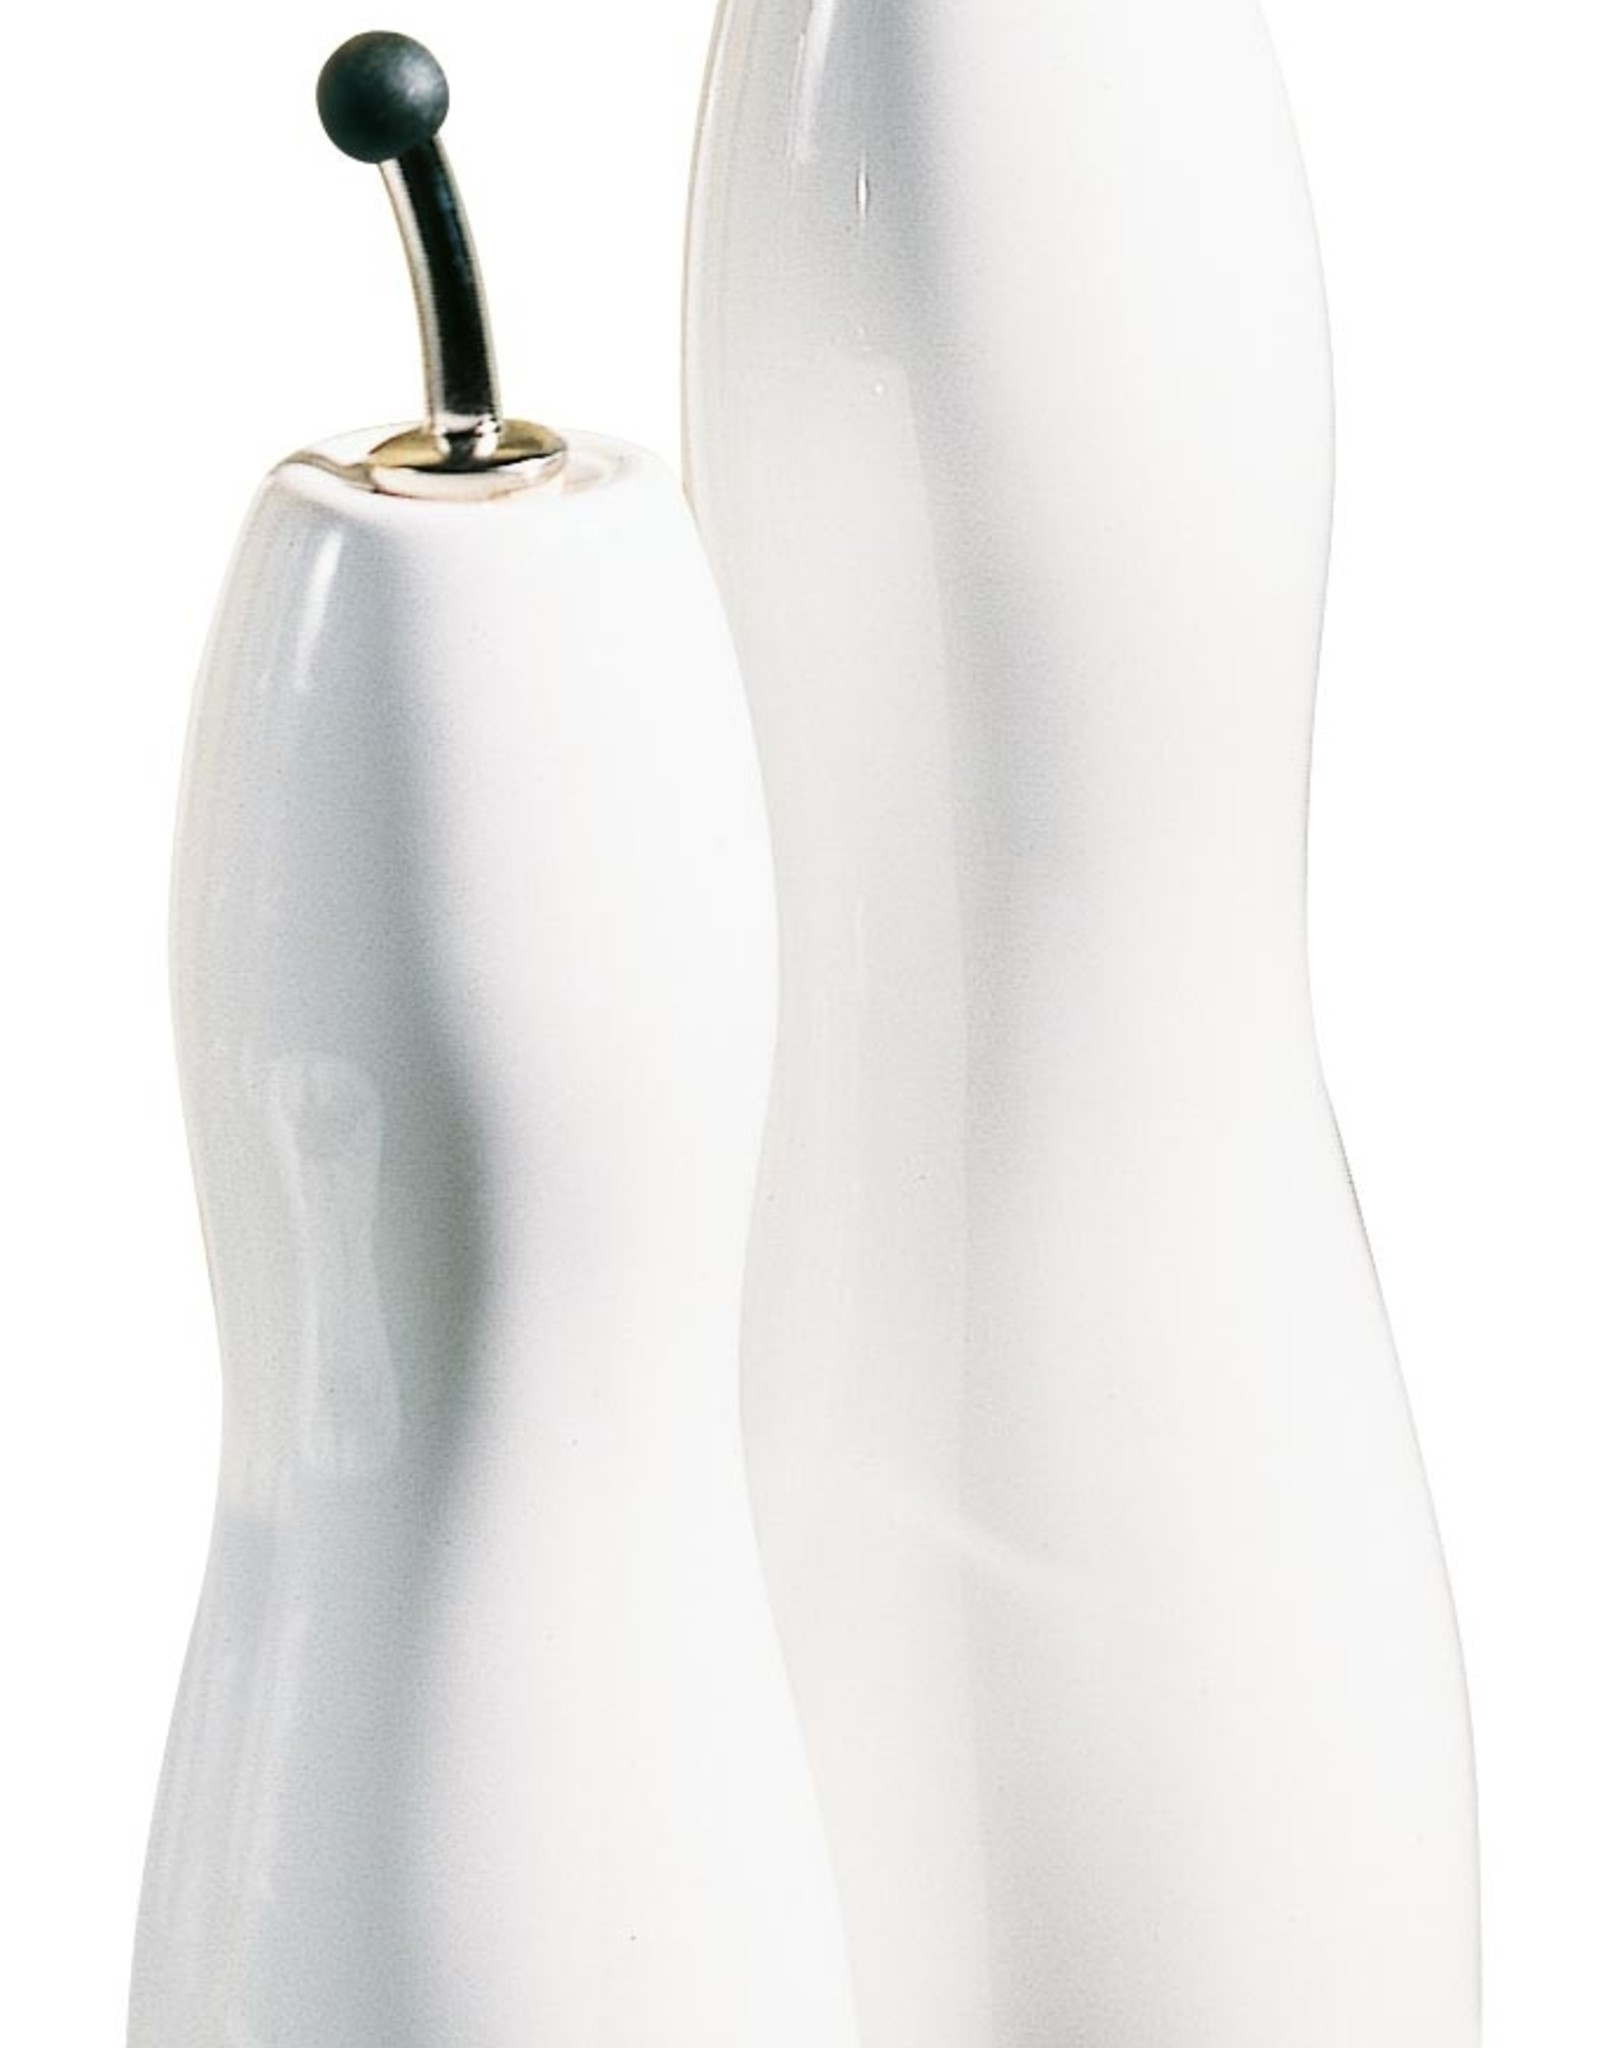 ASA ASA Olie- en Azijnfles Gegolfd Porselein Wit 1.1L